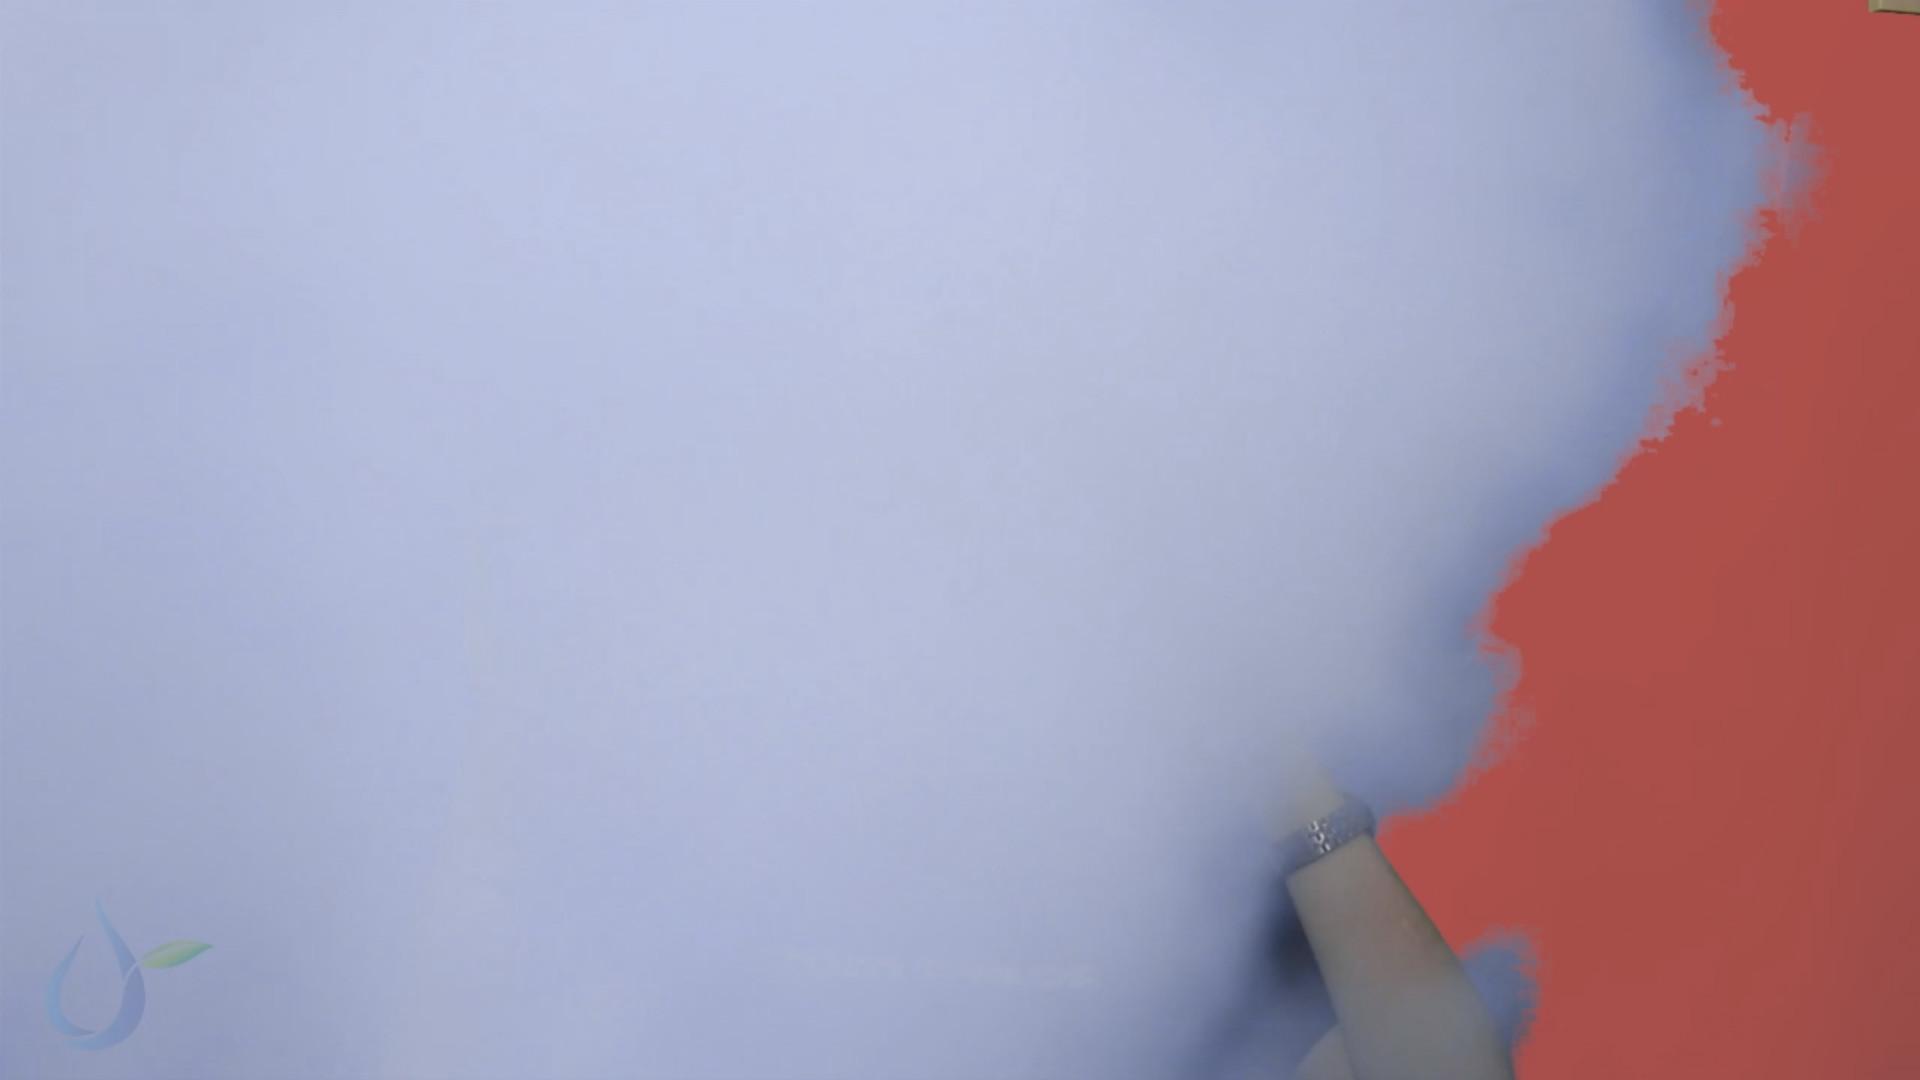 Vape Trick Tutorial | Vape Bending Bild 5 | AMT-VAPE